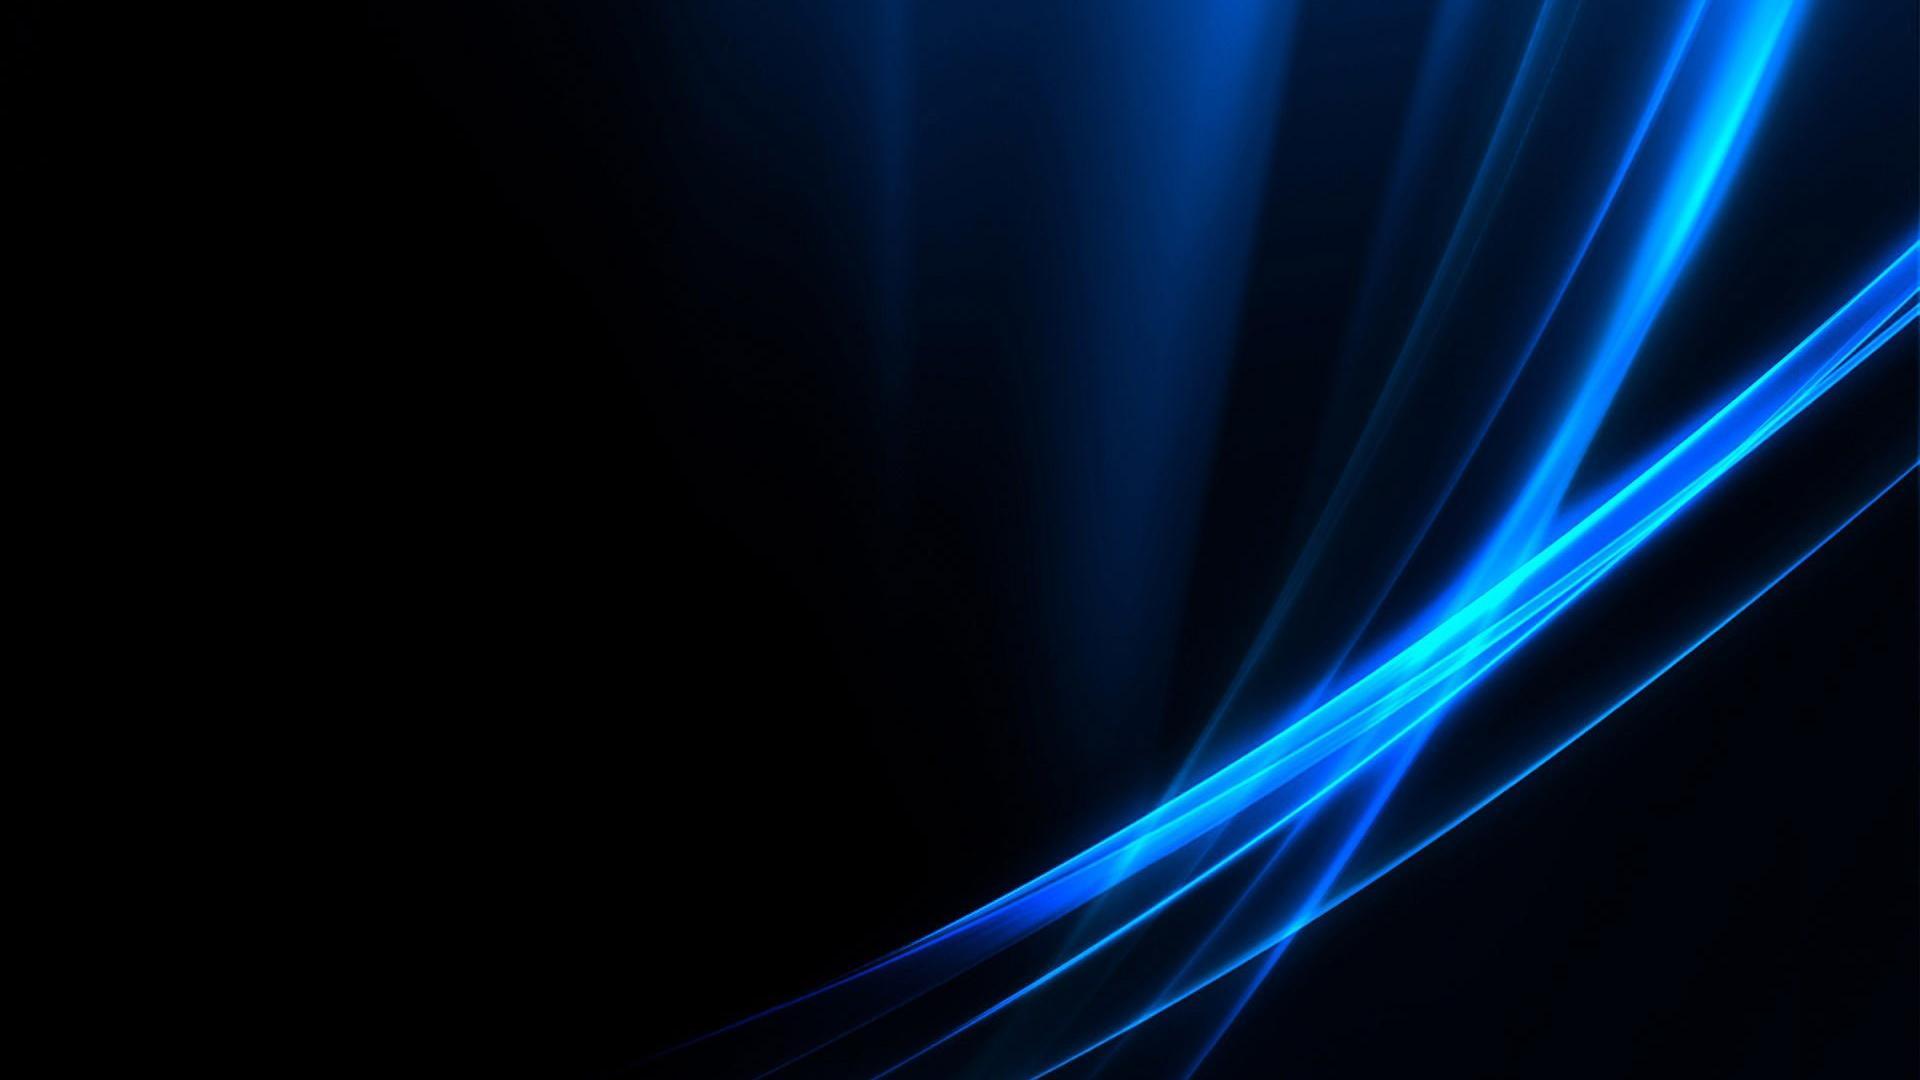 Free Download Blue Wallpaper 1920x1080 Wallpapers Hd 1080p